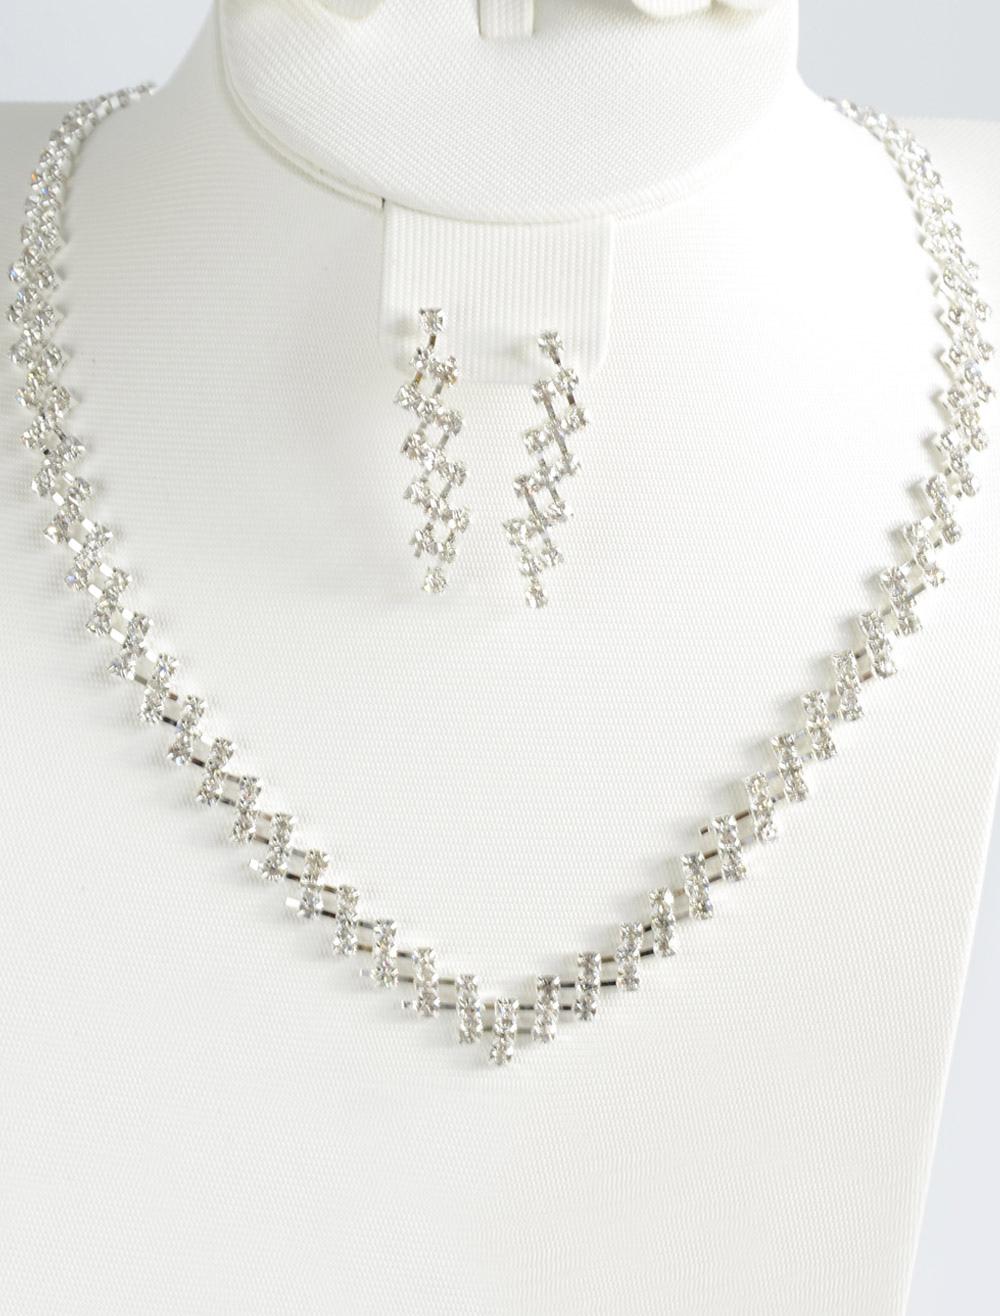 Silver Wedding Necklace and Earrings Rhinestone Pierced Metal  Jewelry Set